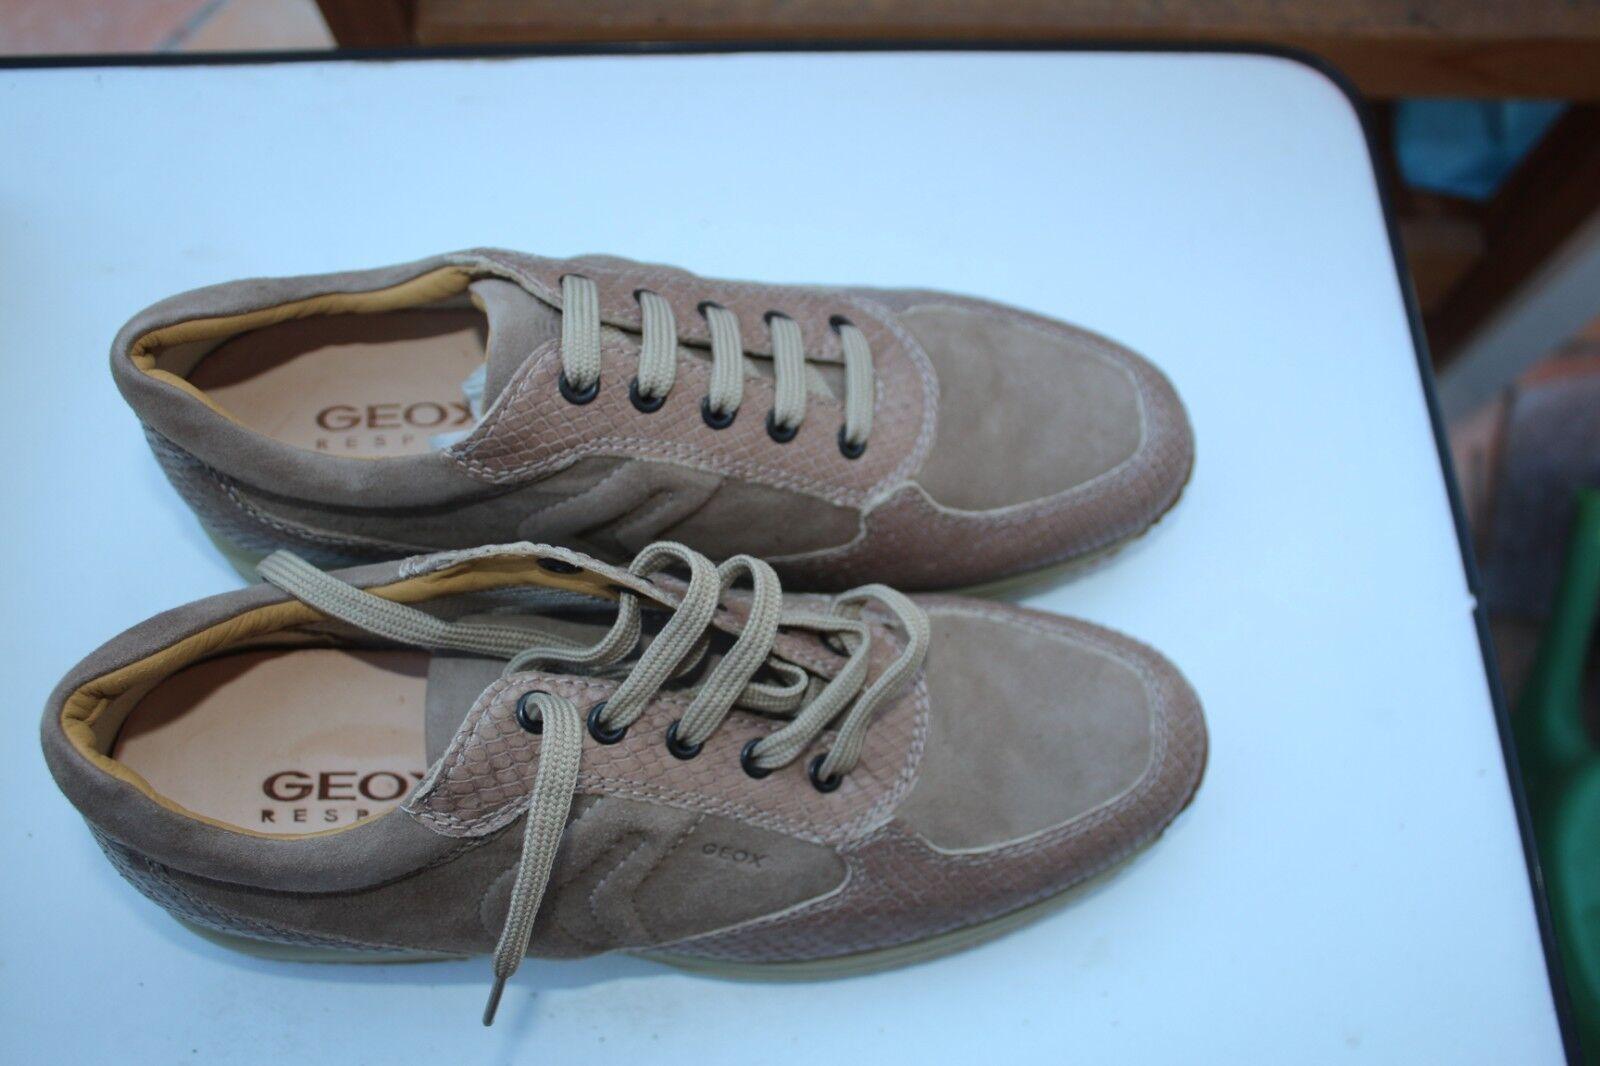 Schuhe - Geox Gr. 41 Wildleder - hellbraun    - Neuware 92dc31